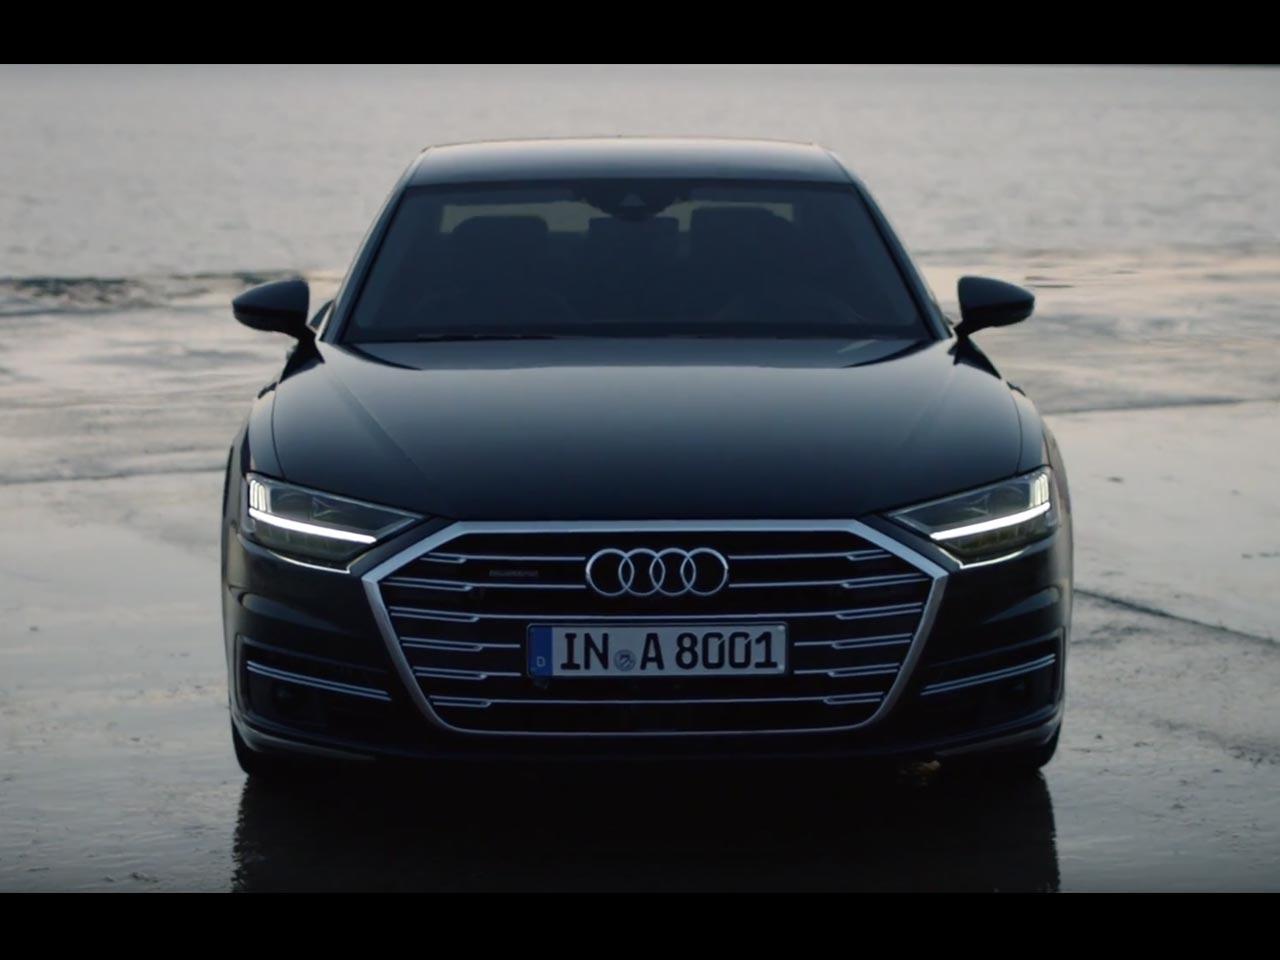 Audi-A8-2018-neuve-Maroc-video.jpg